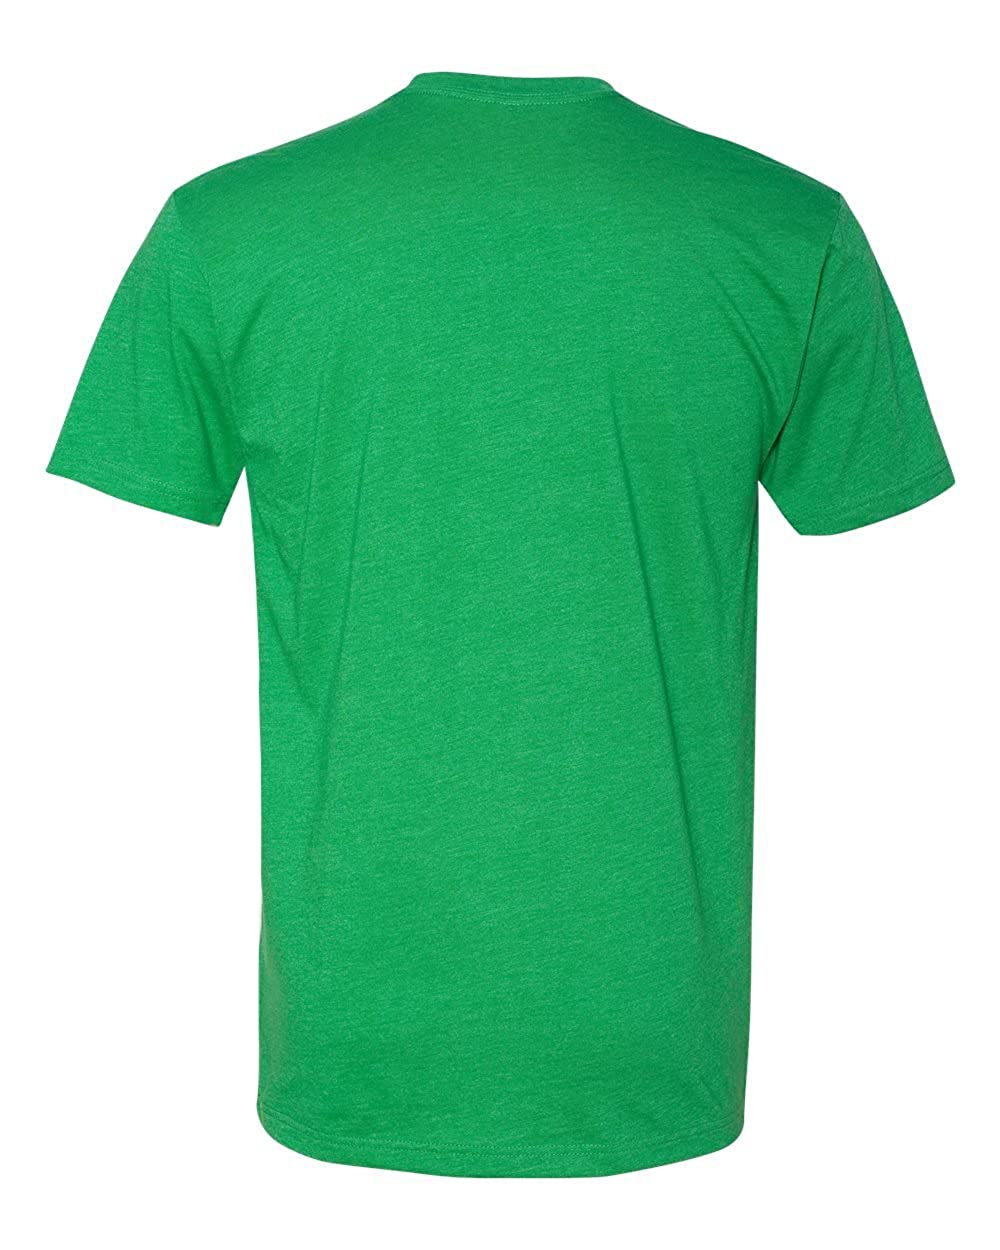 Kelly Green XXX-Large Next Level Mens Baby Rib Collar Premium T-Shirt